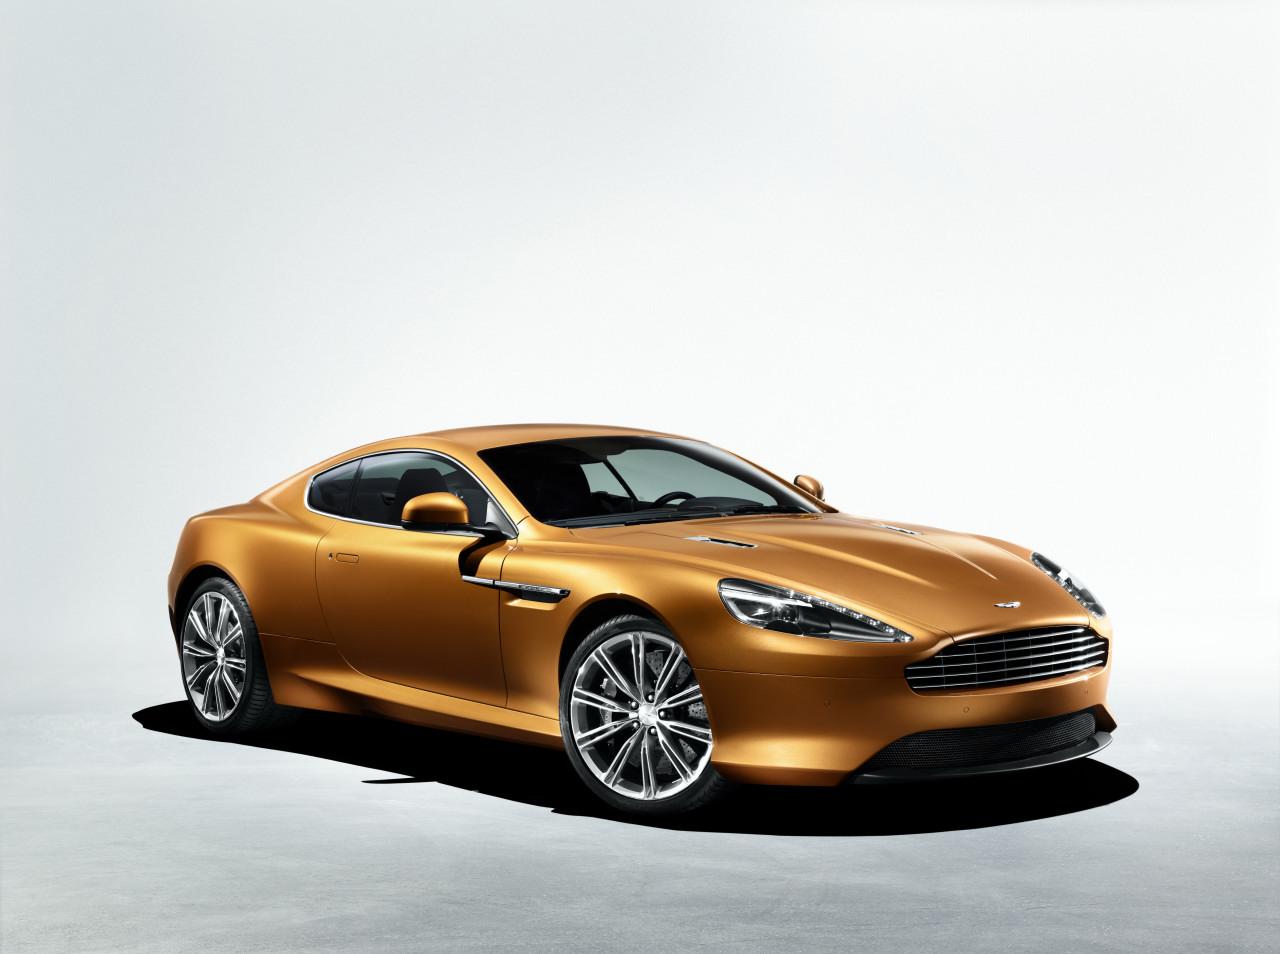 Aston Martin Virage II 2011 - 2012 Coupe #4